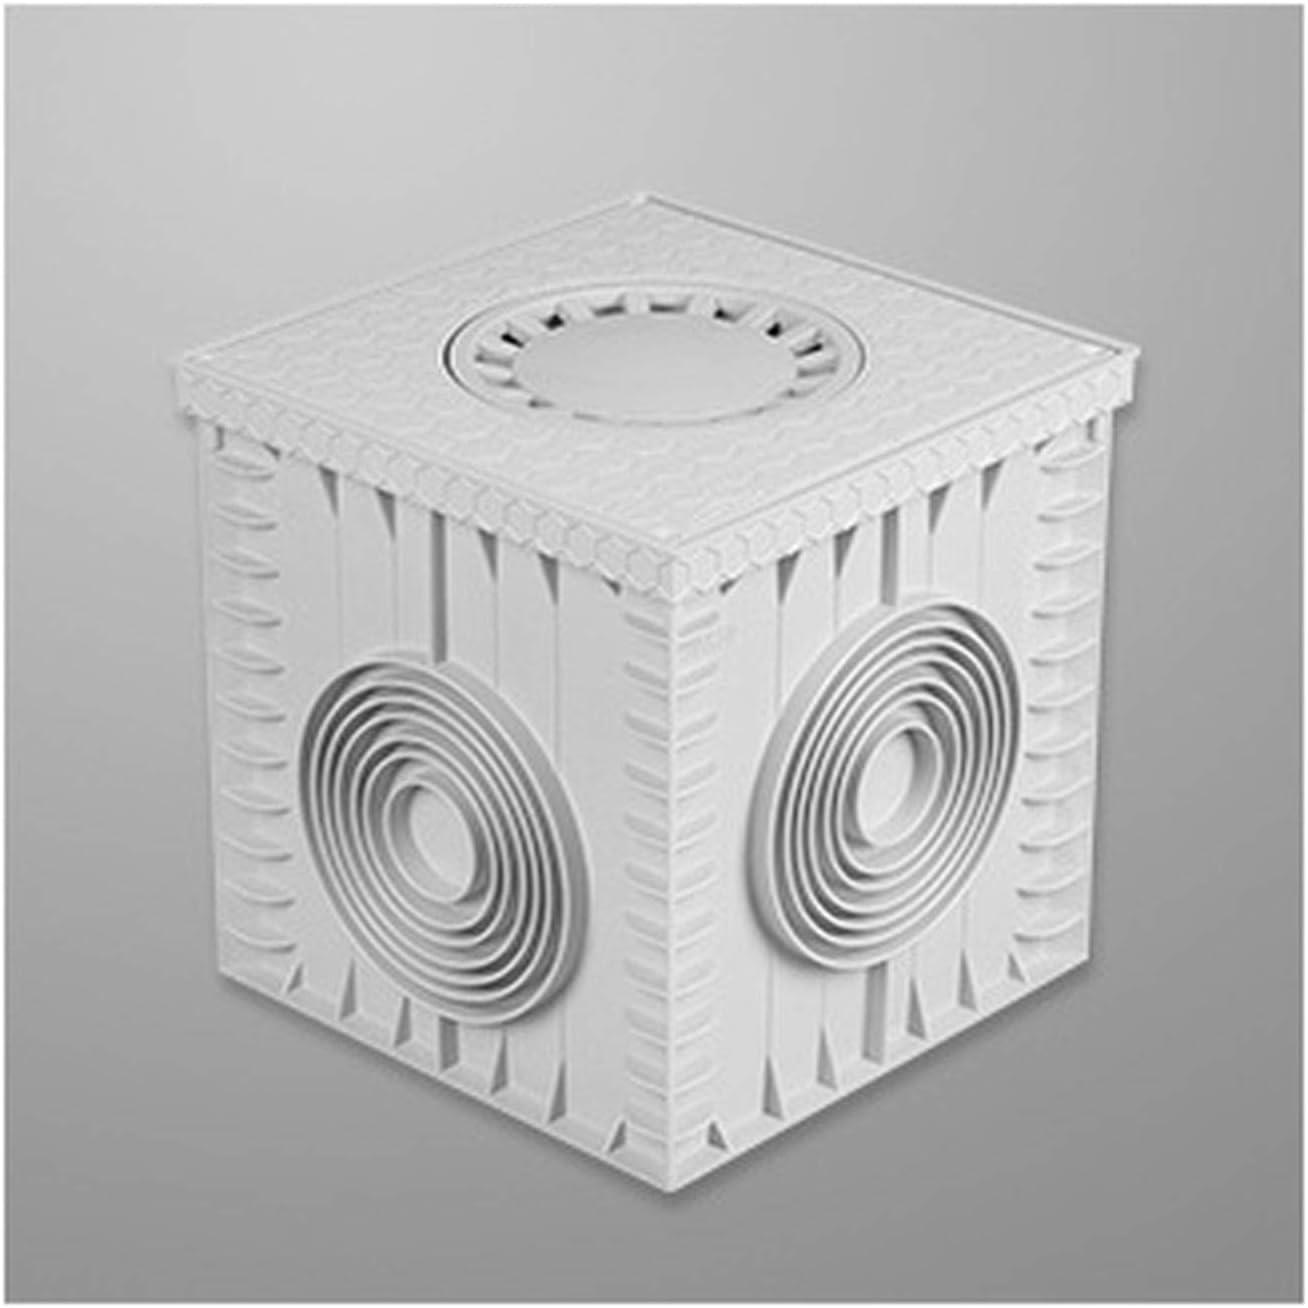 30x39cm Tapa Para Arqueta Desagüe Cubierta Adequa Cisterna Tapas Arquetas Tapadera plastico composite PP: Amazon.es: Hogar